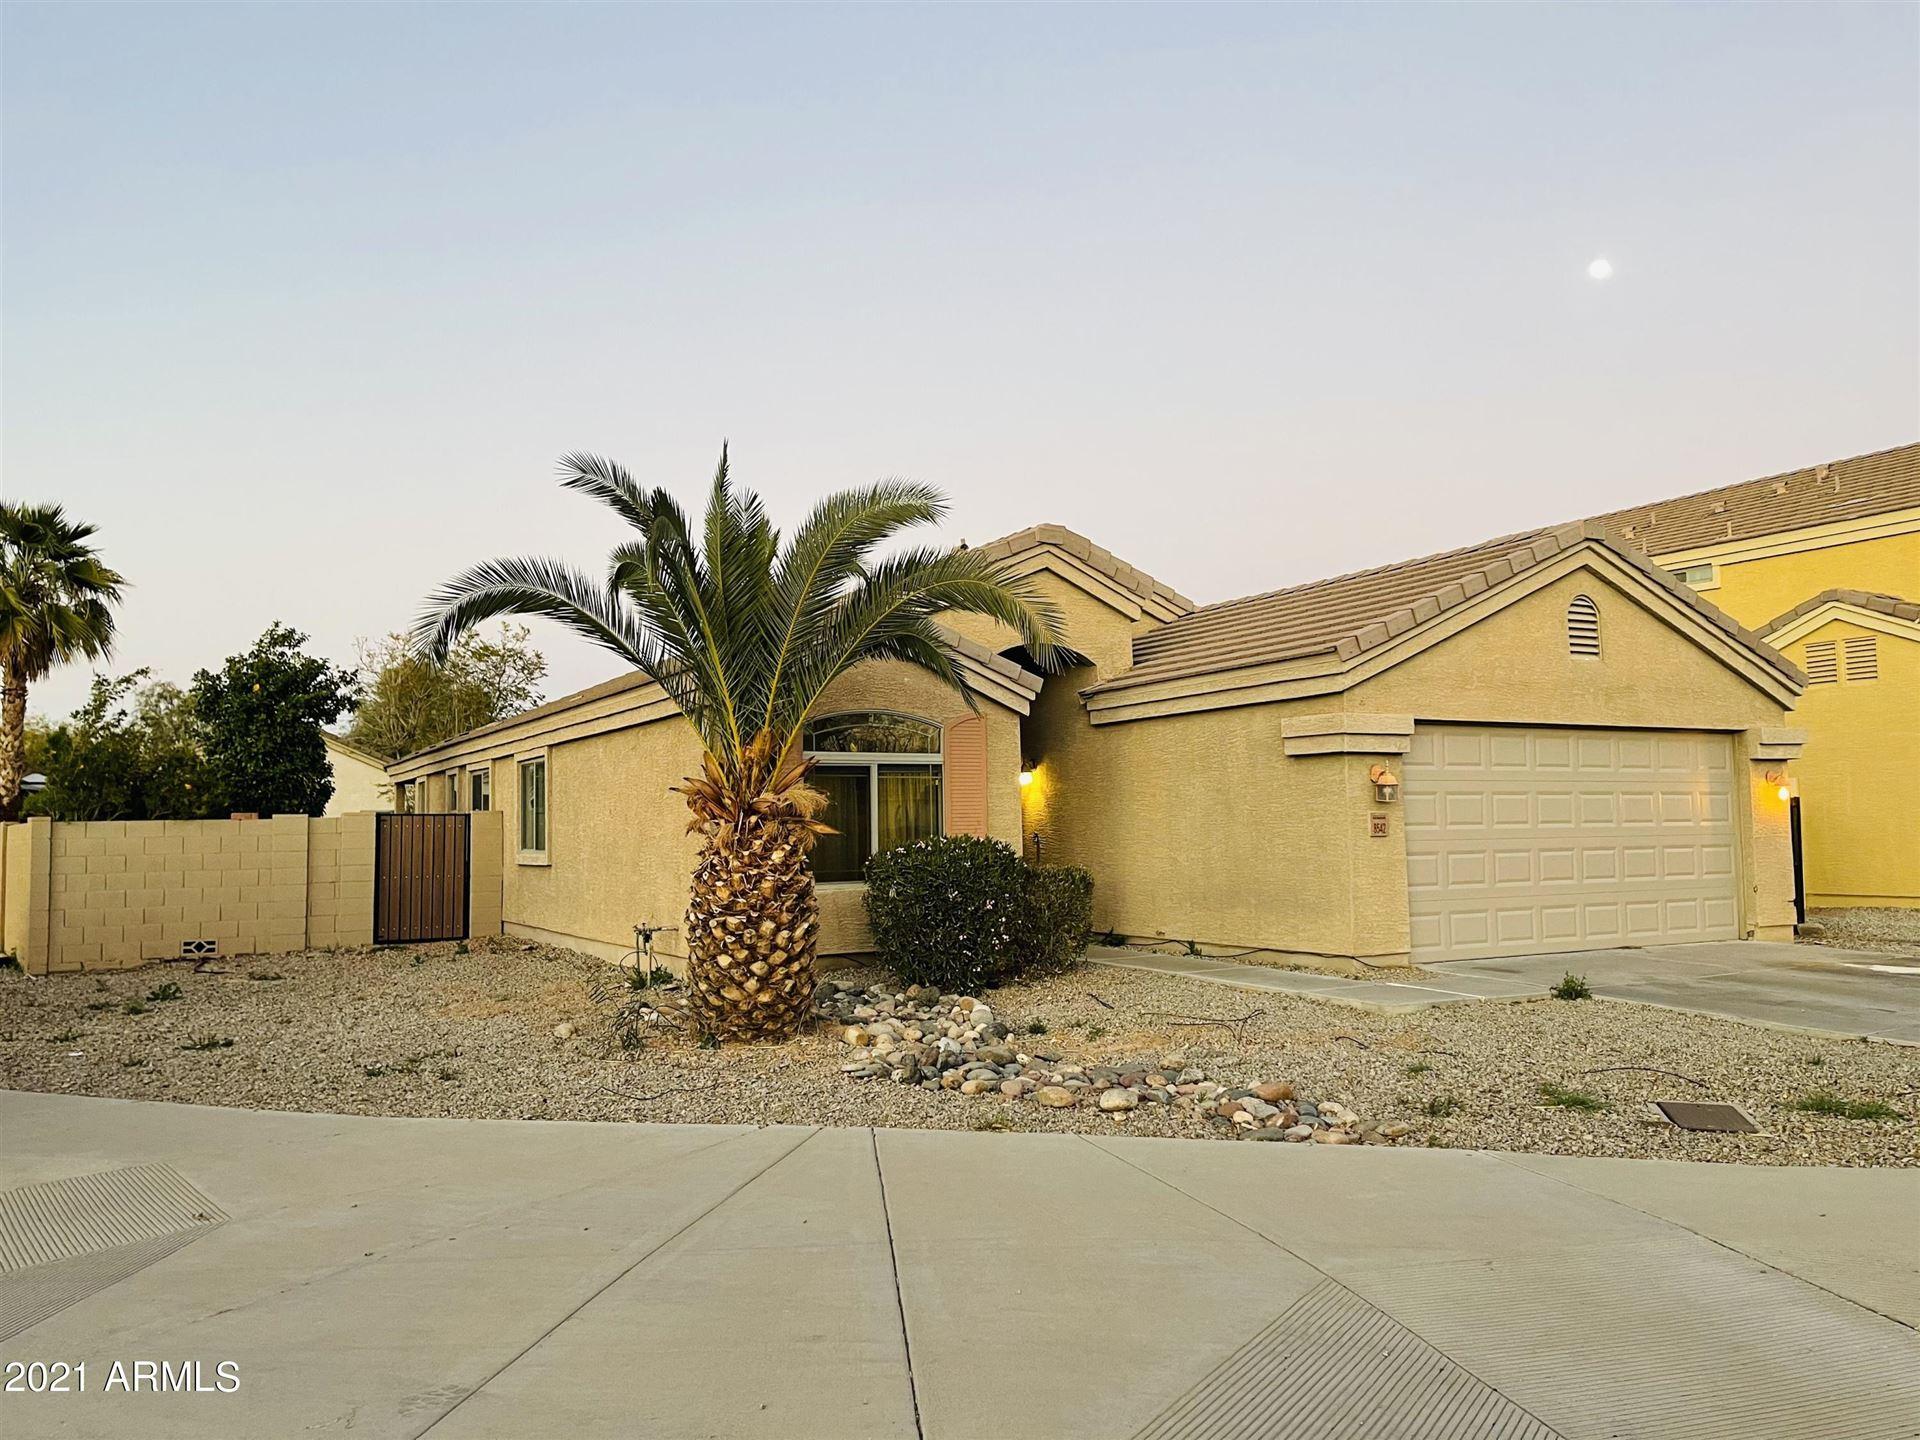 Photo of 8542 W CORDES Road, Tolleson, AZ 85353 (MLS # 6200165)